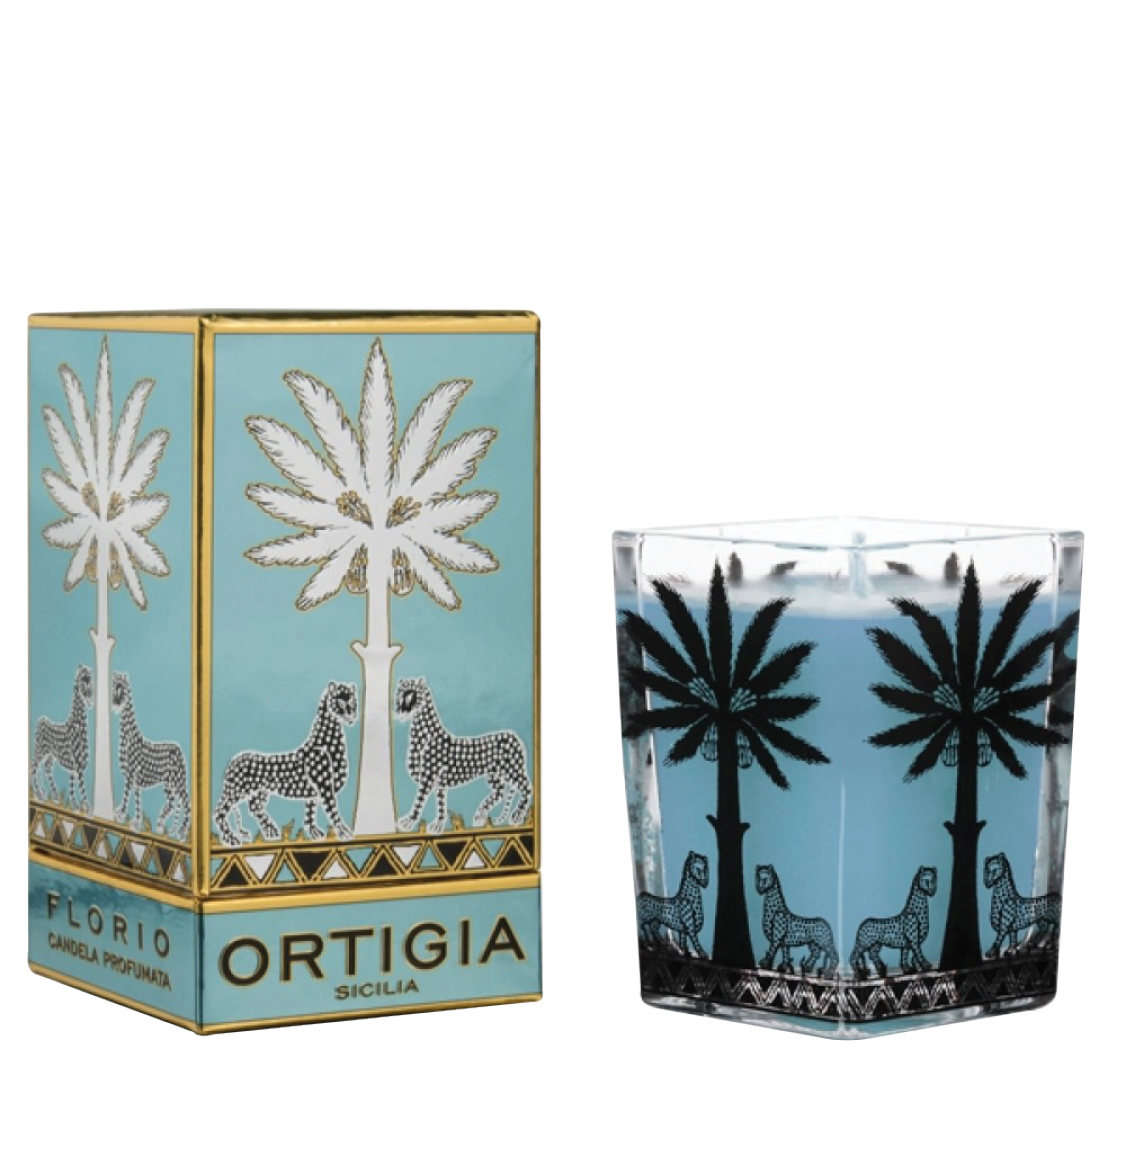 Ortigia Sicilia Florio Candle 170g